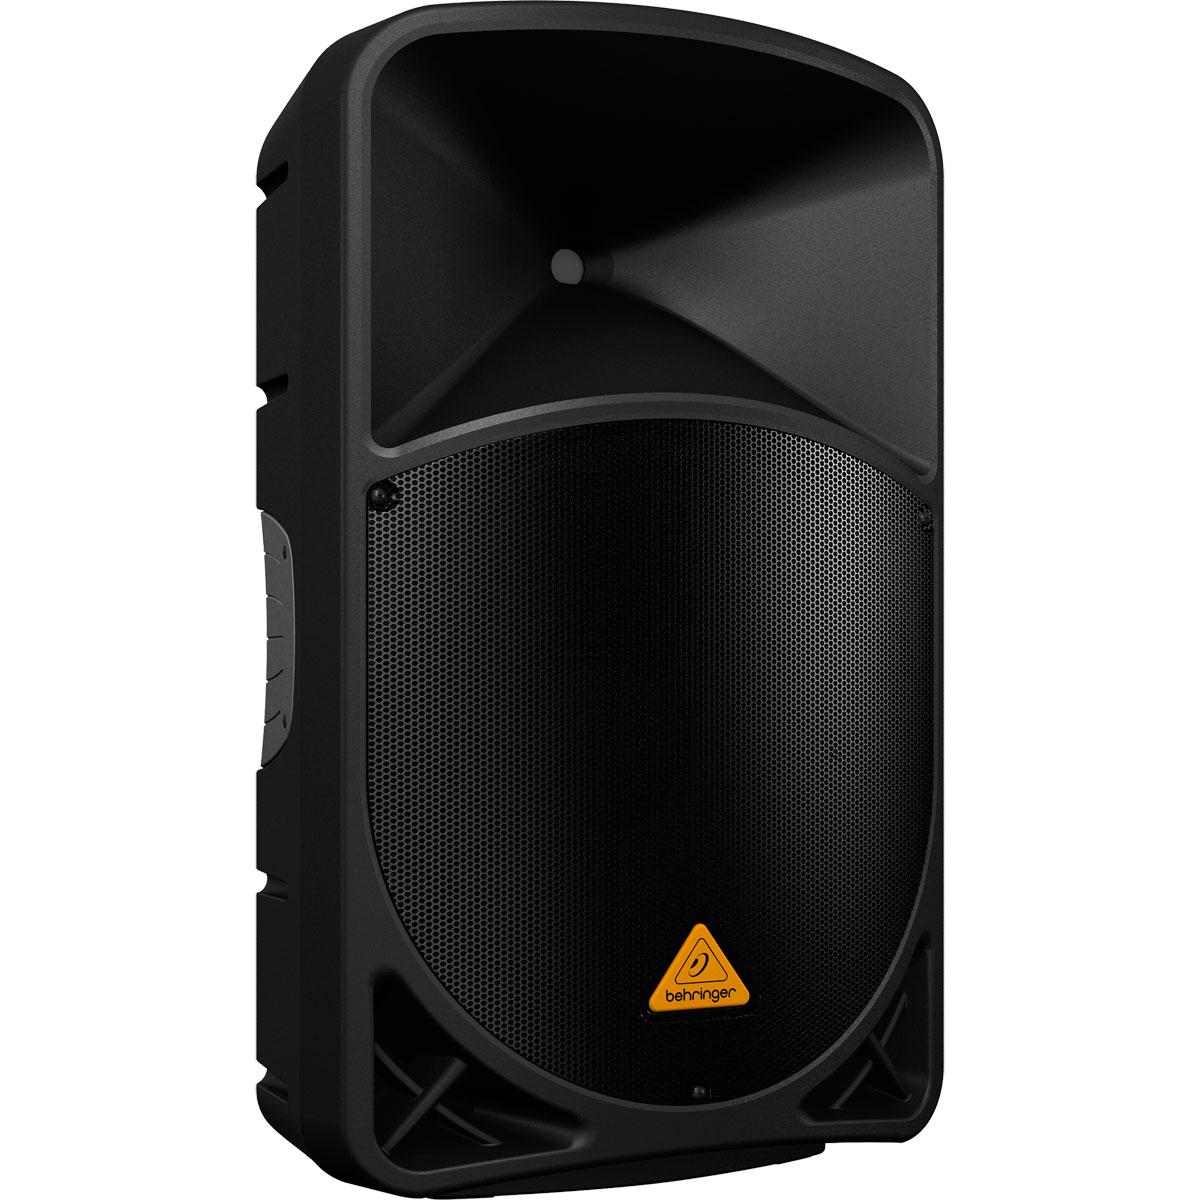 B115MP3 - Caixa Ativa 1000W c/ Player USB B 115 MP3 - Behringer